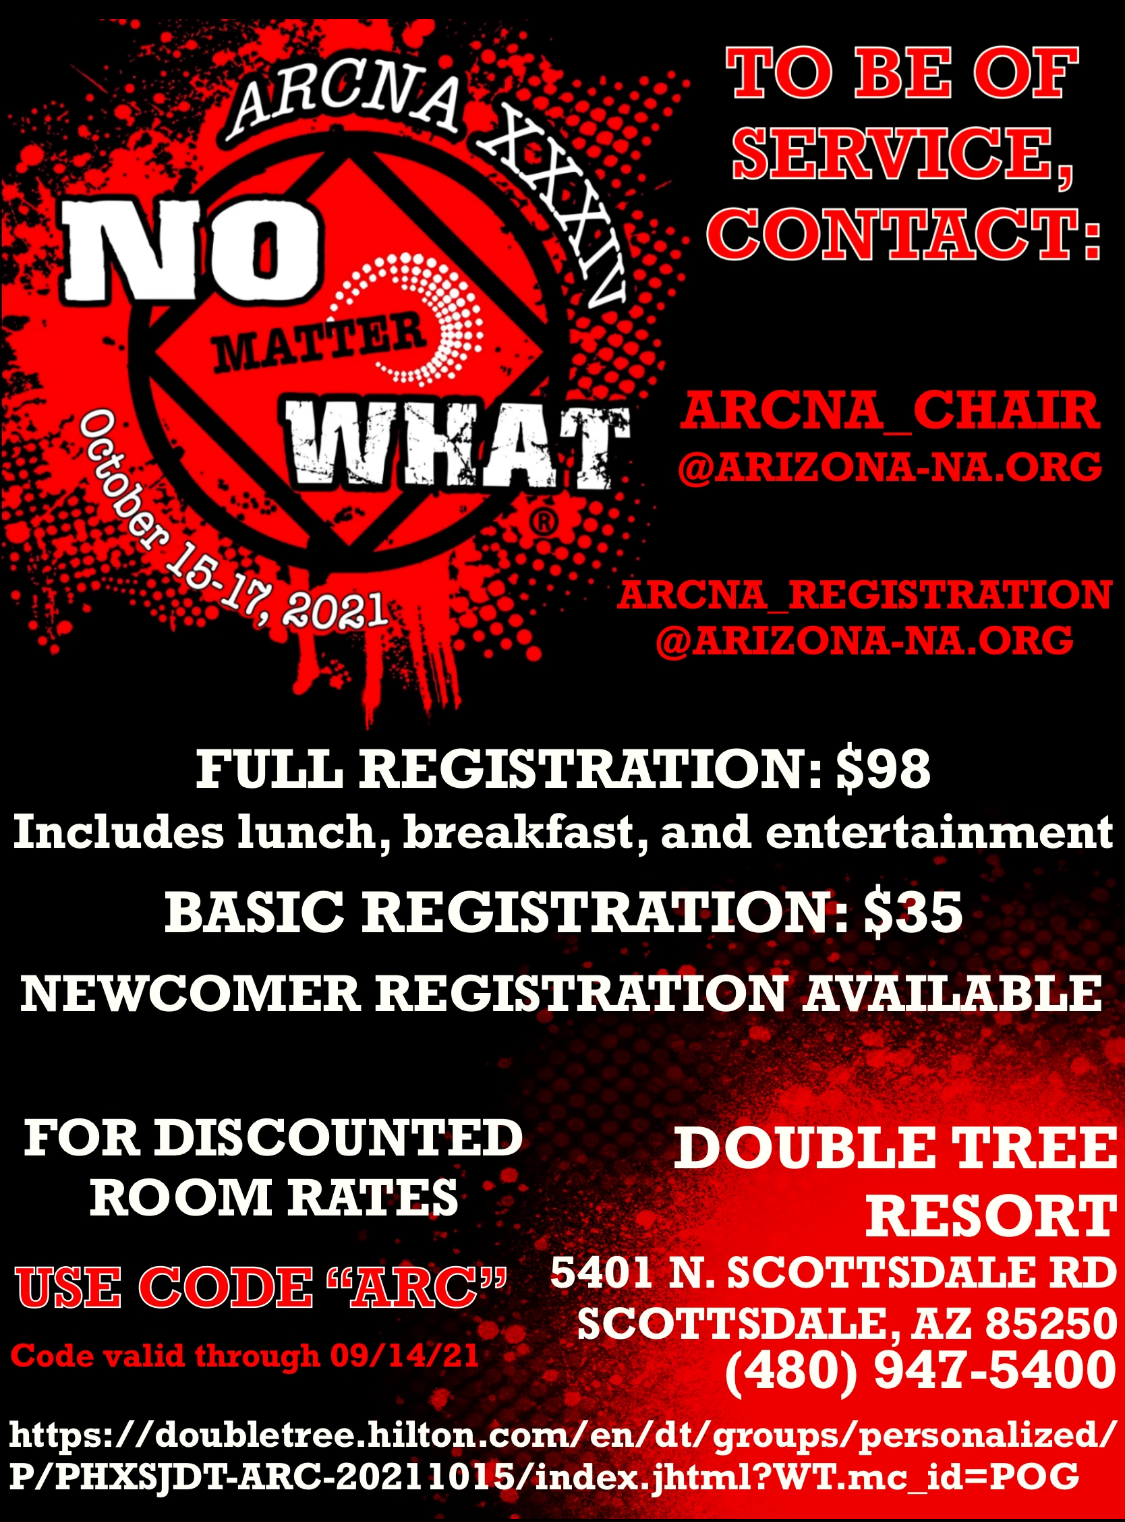 Arizona Regional Convention